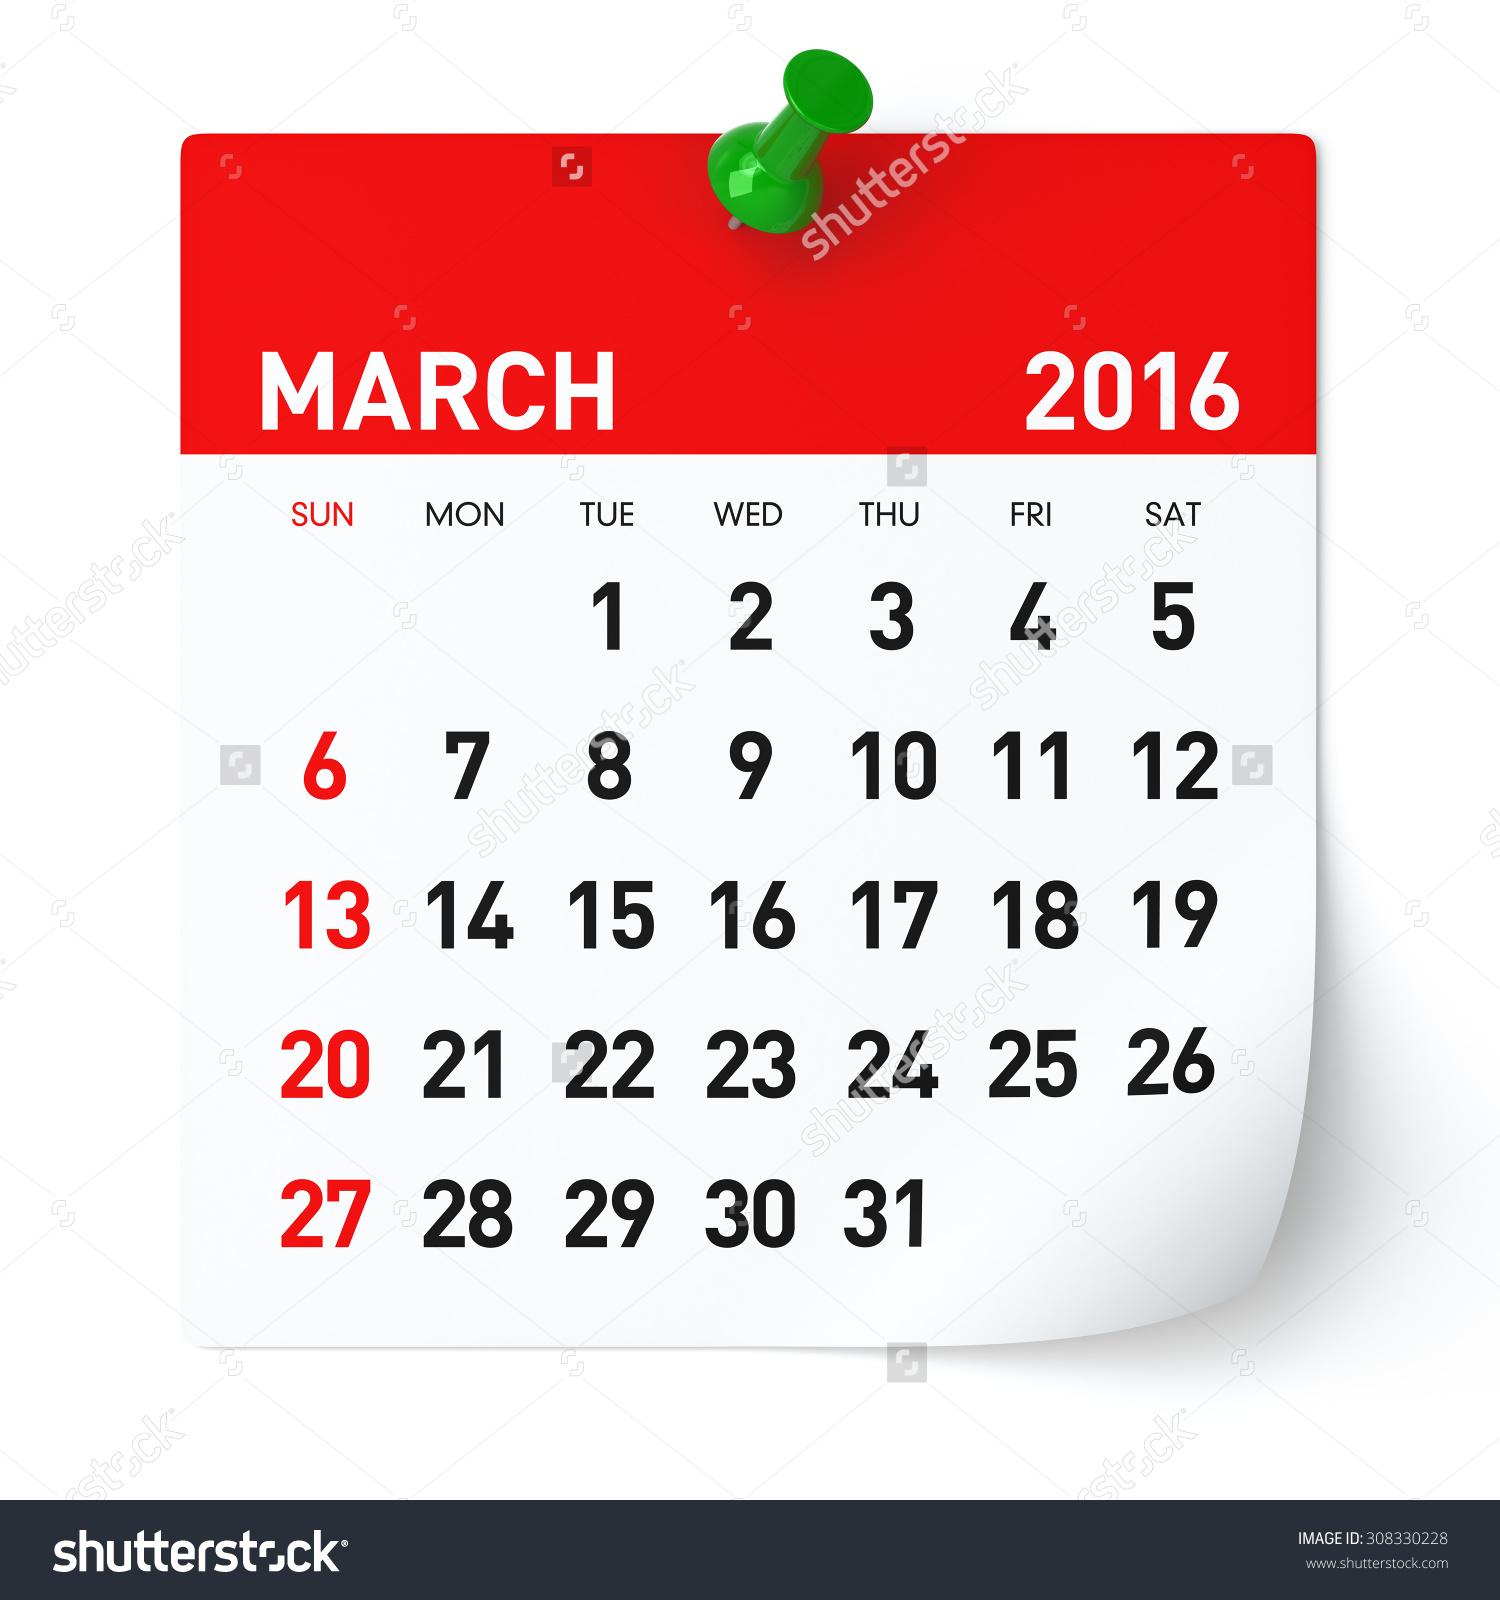 March 2016 calendar clipart banner download March 2016 calendar clipart - ClipartFest banner download